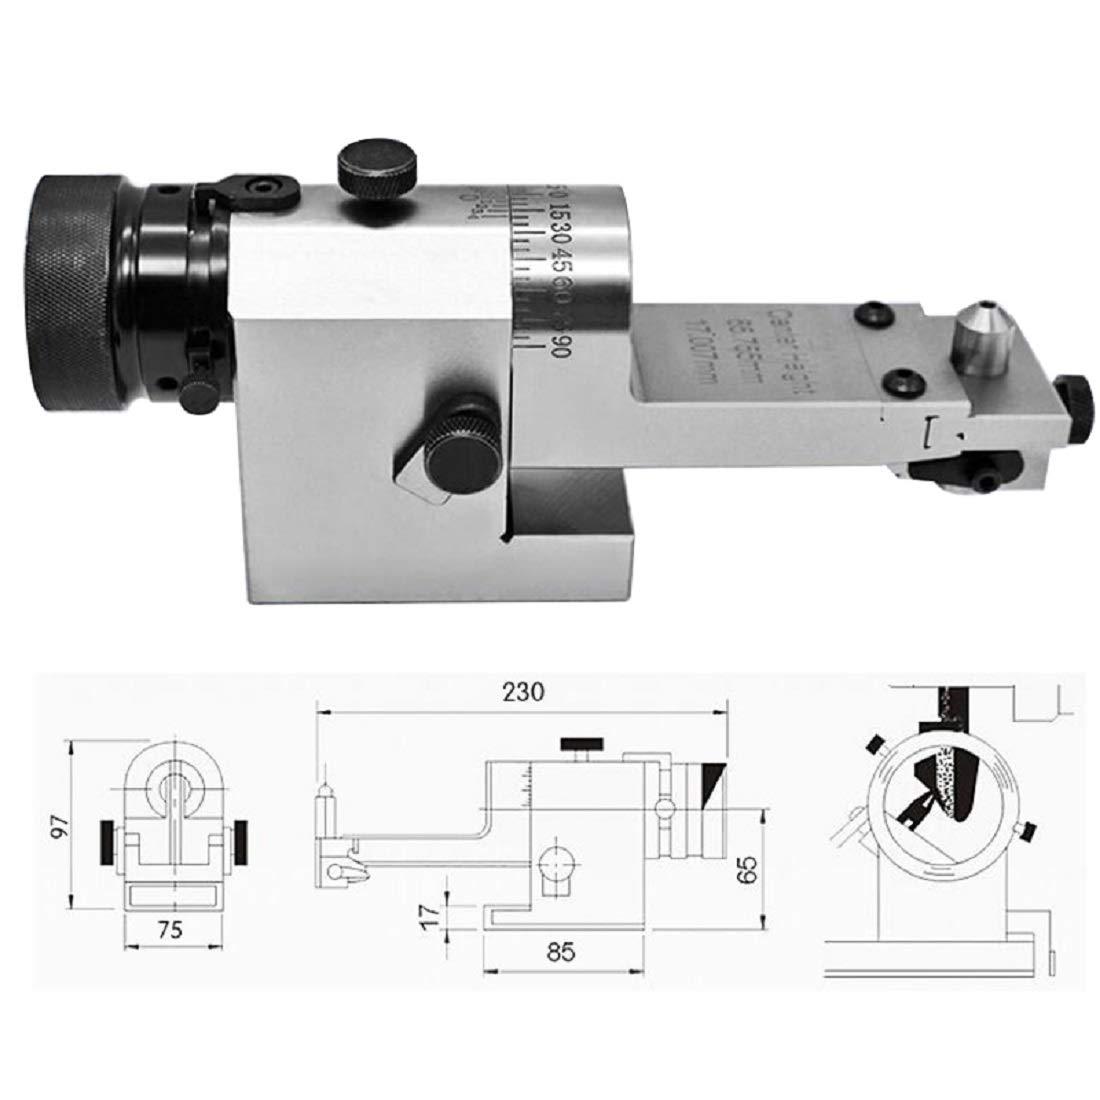 Perspective Grinding Wheel Dresser Visual Optical Radius Angle Dresser Value Line Optical Grinding Wheel Radius Angle Dresser by tinsay (Image #3)